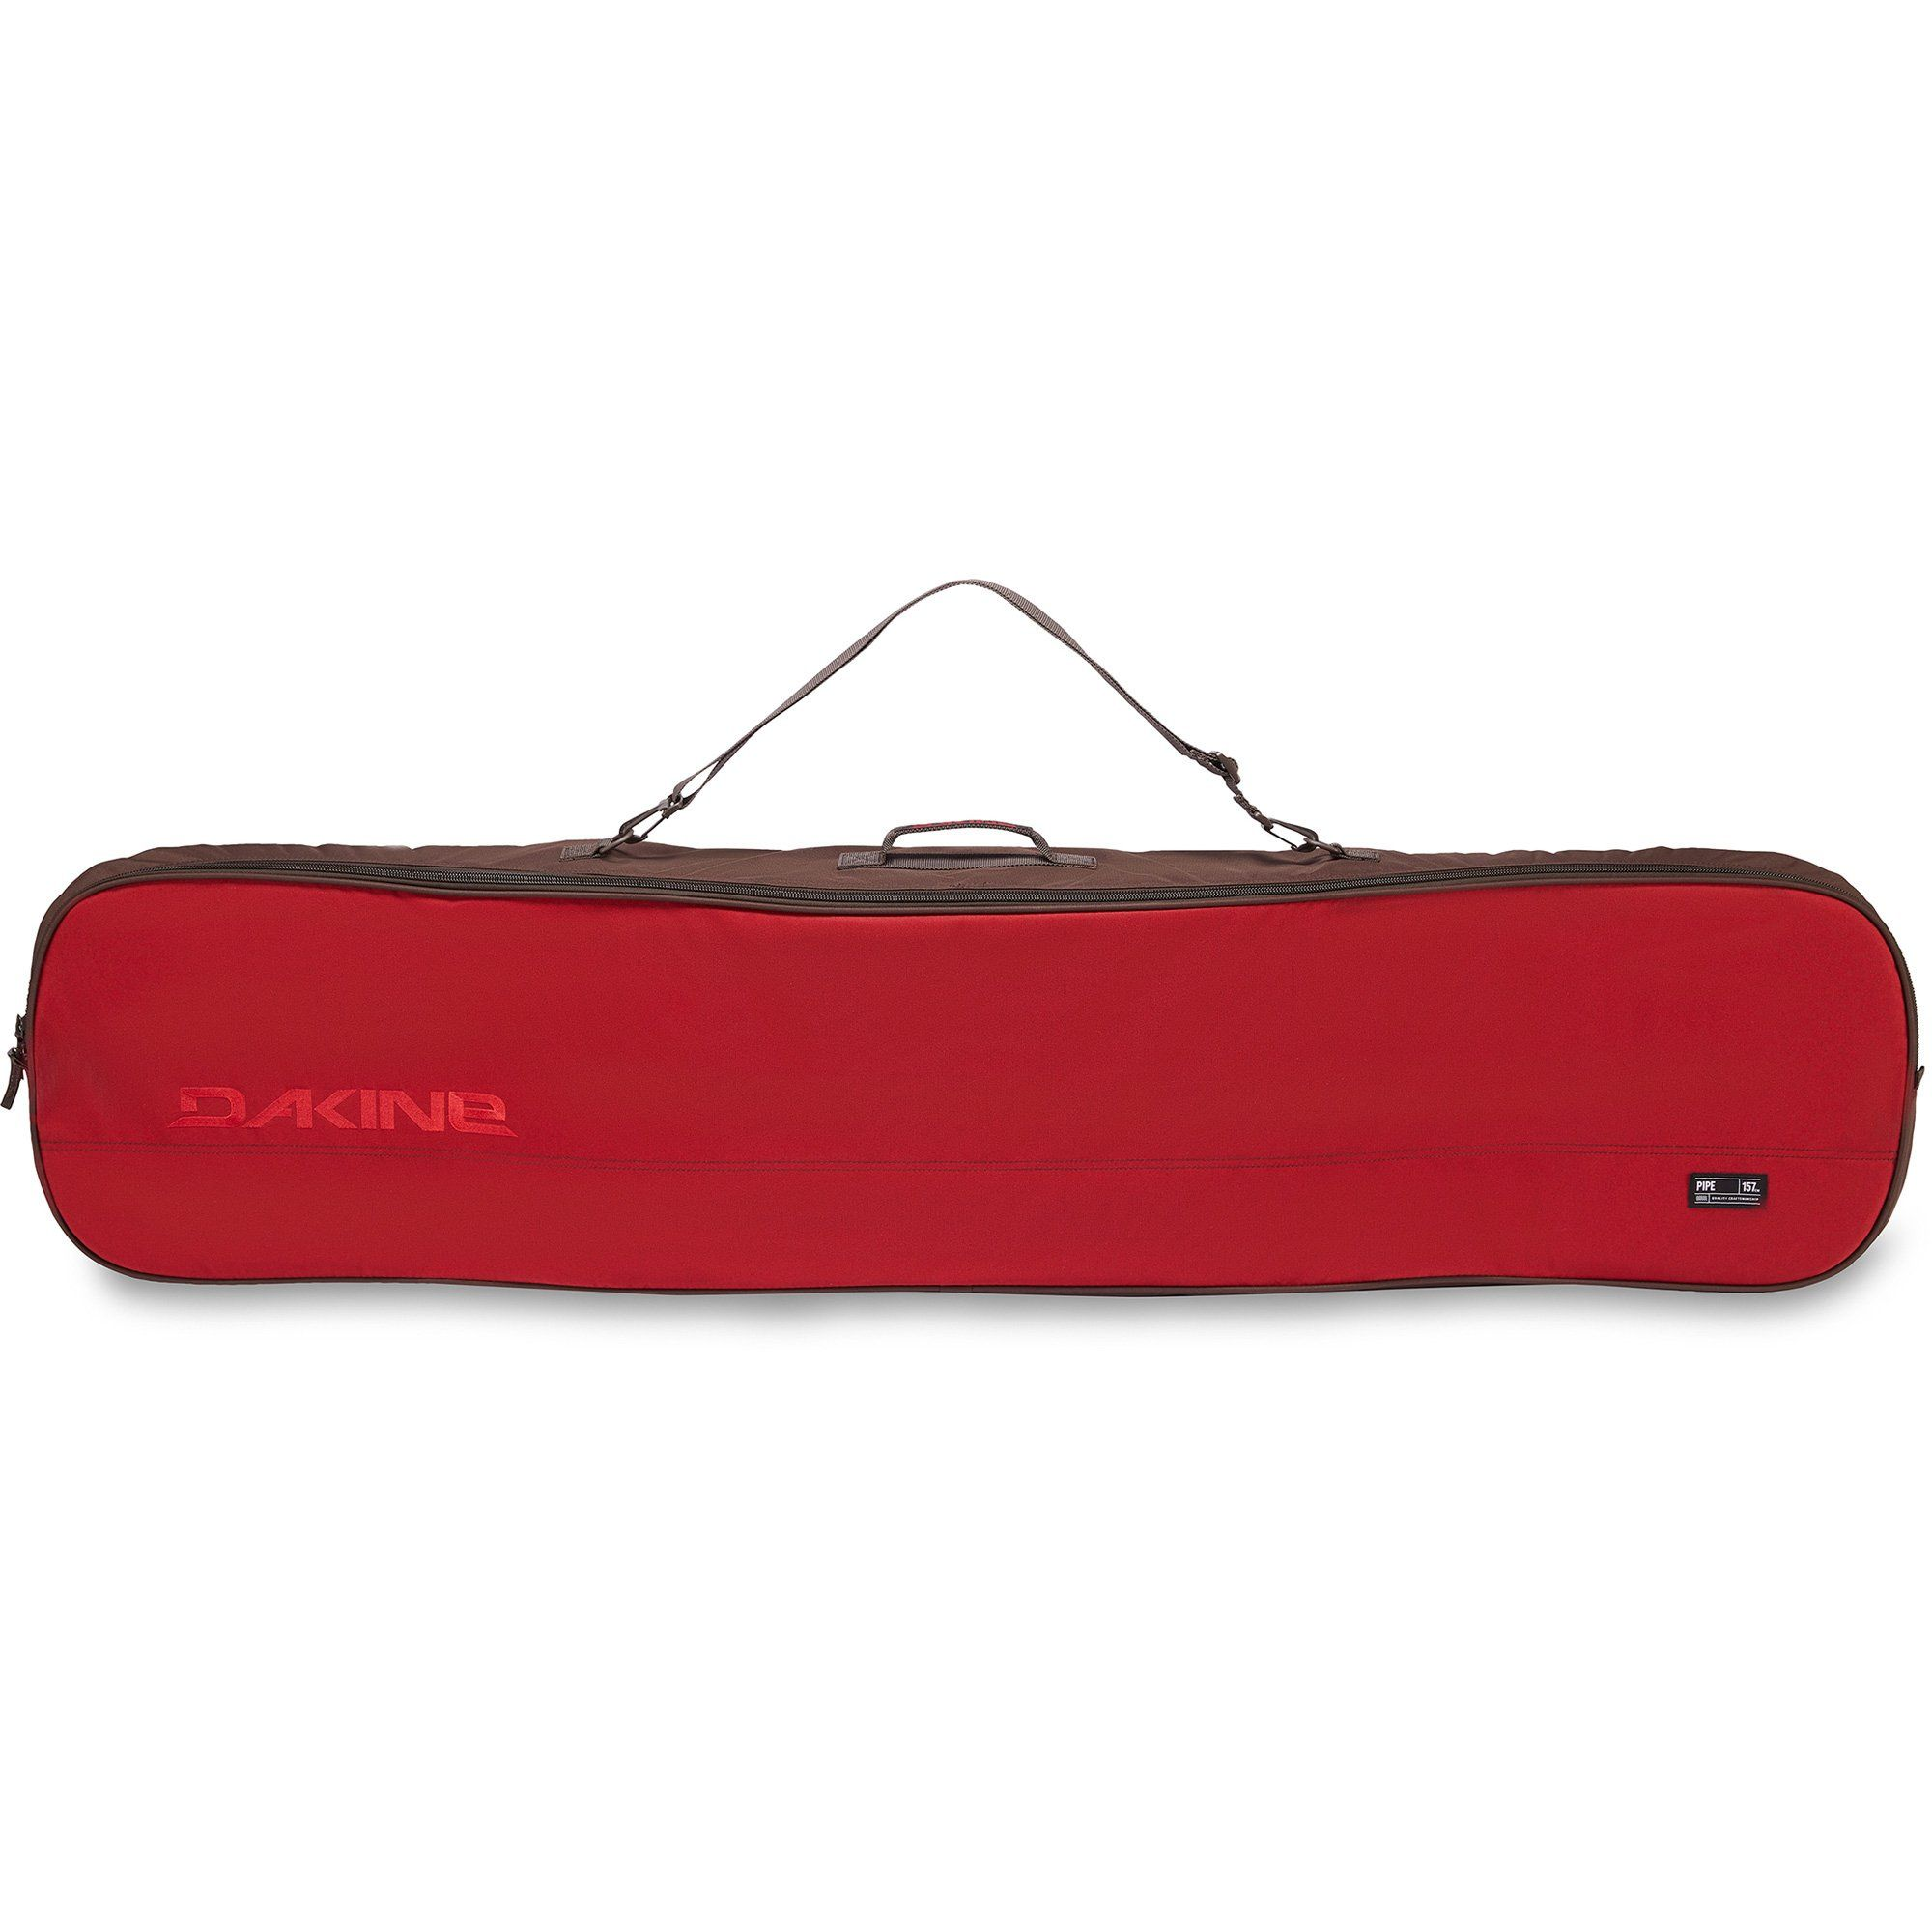 Dakine snowboardbag Pipe